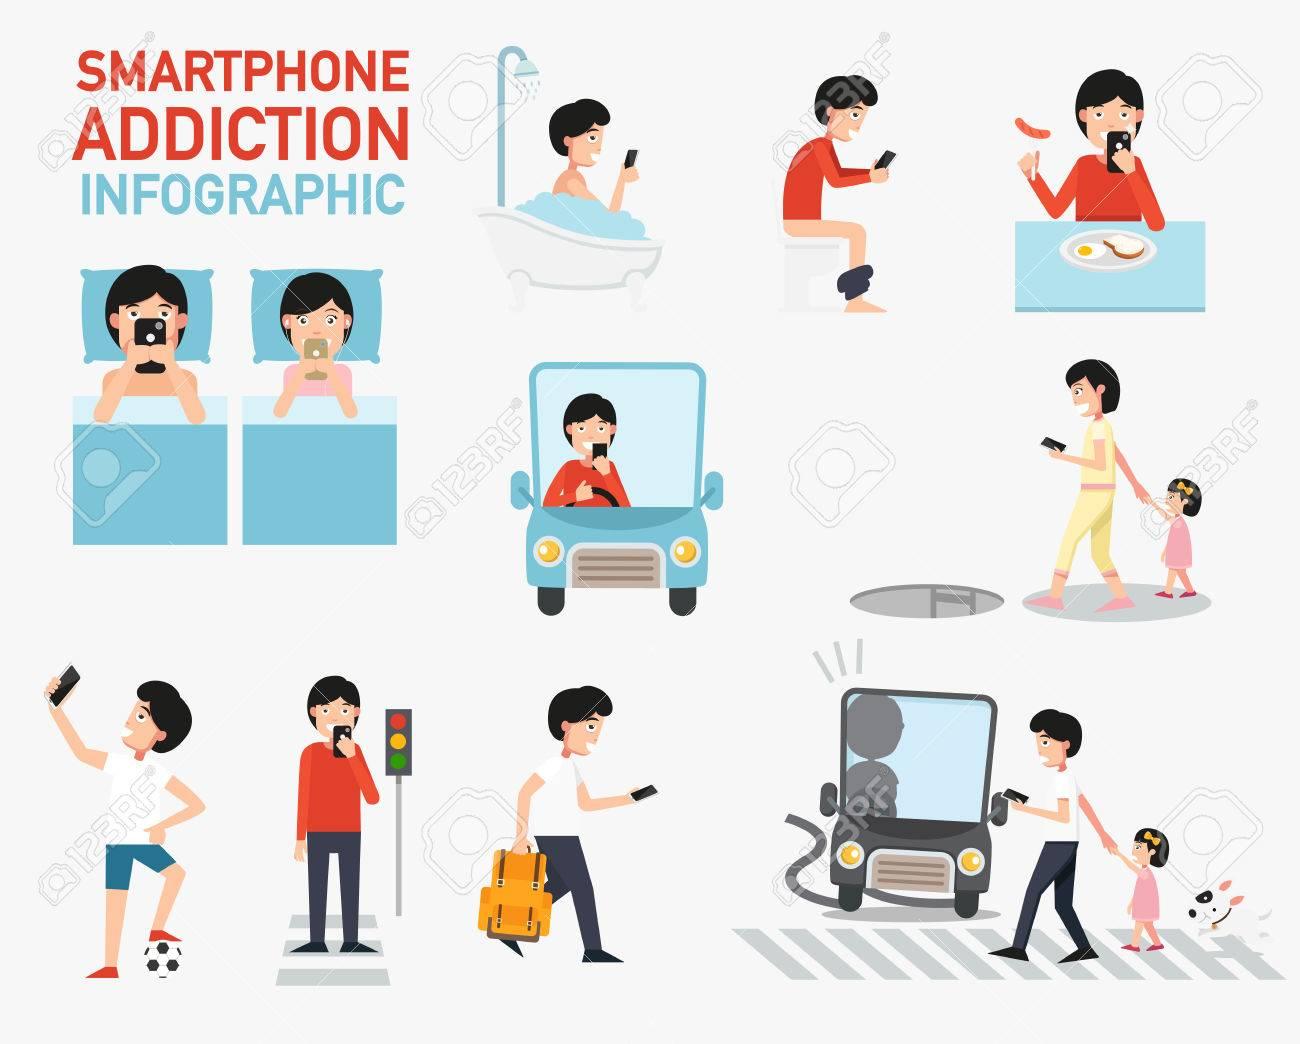 Smartphone addiction infographic vector illustration